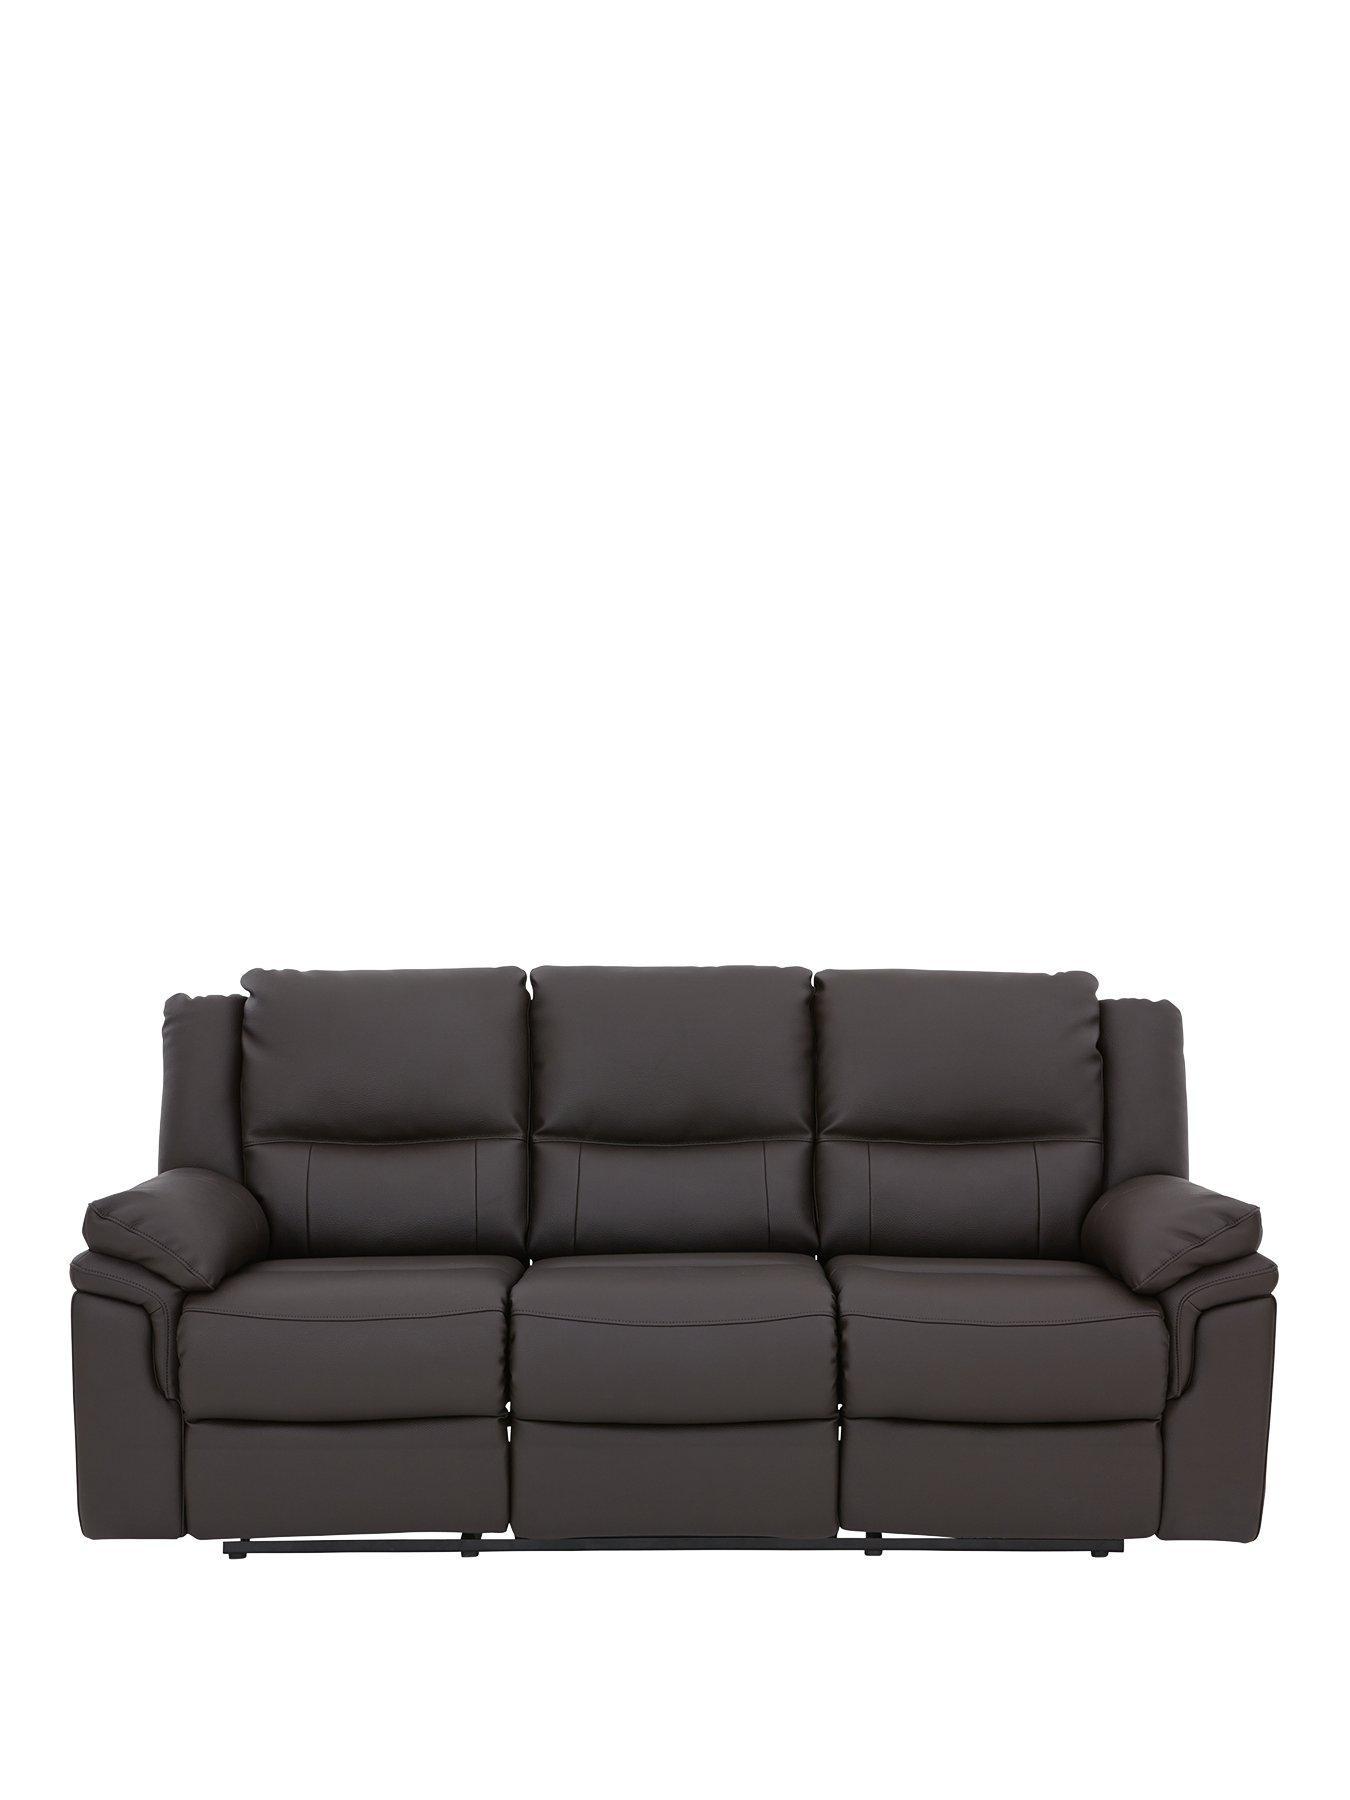 Big Sofa 240 Cm Stunning Sofas With Big Sofa 240 Cm Simple Big